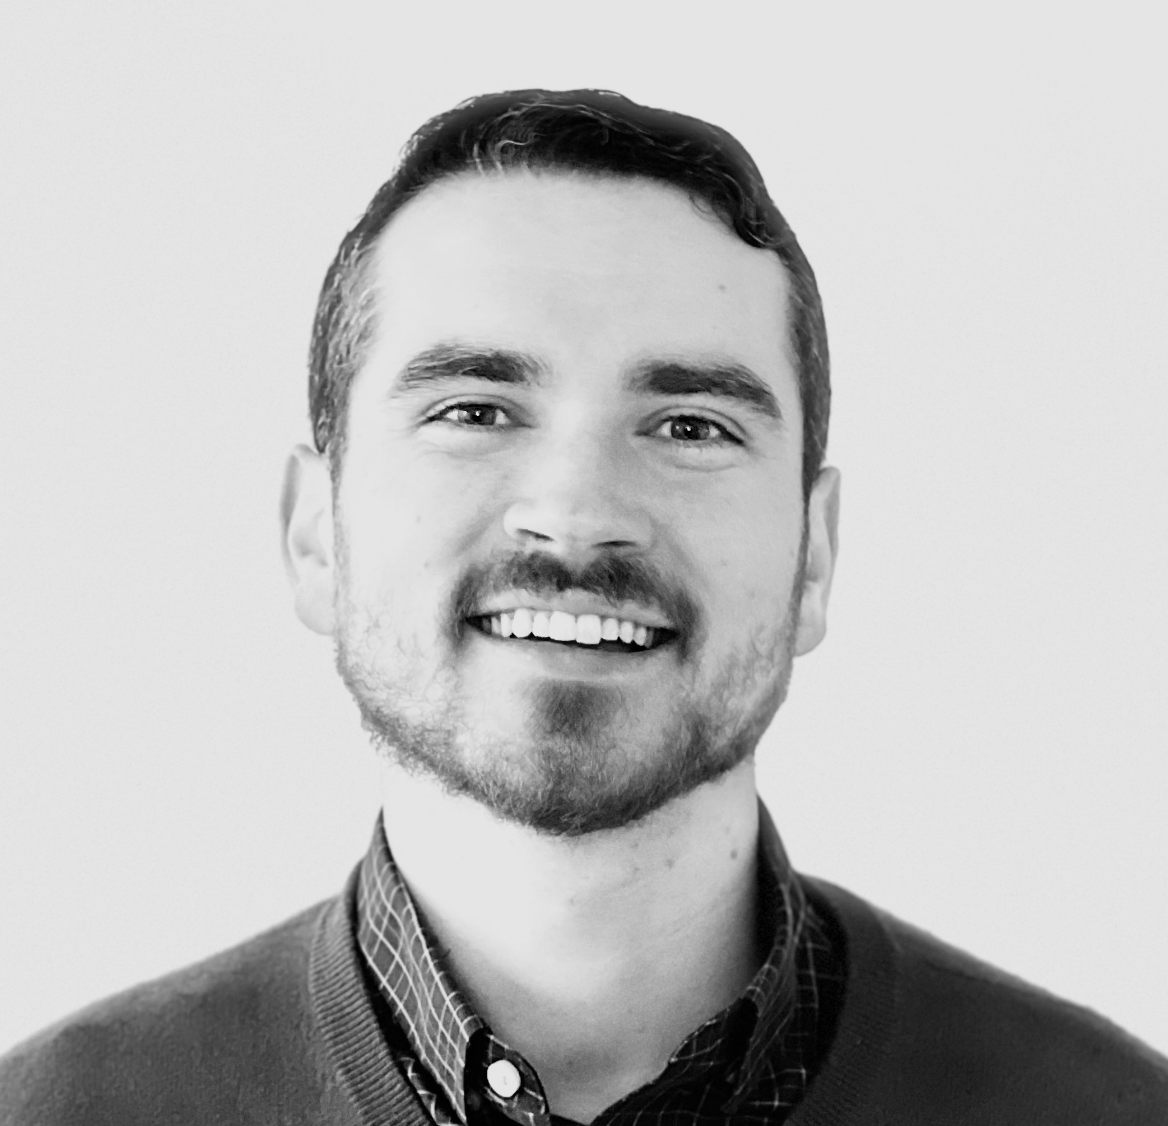 Life Inside a Fast Growth Startup - Zach Garippa, CEO, Negotiatus